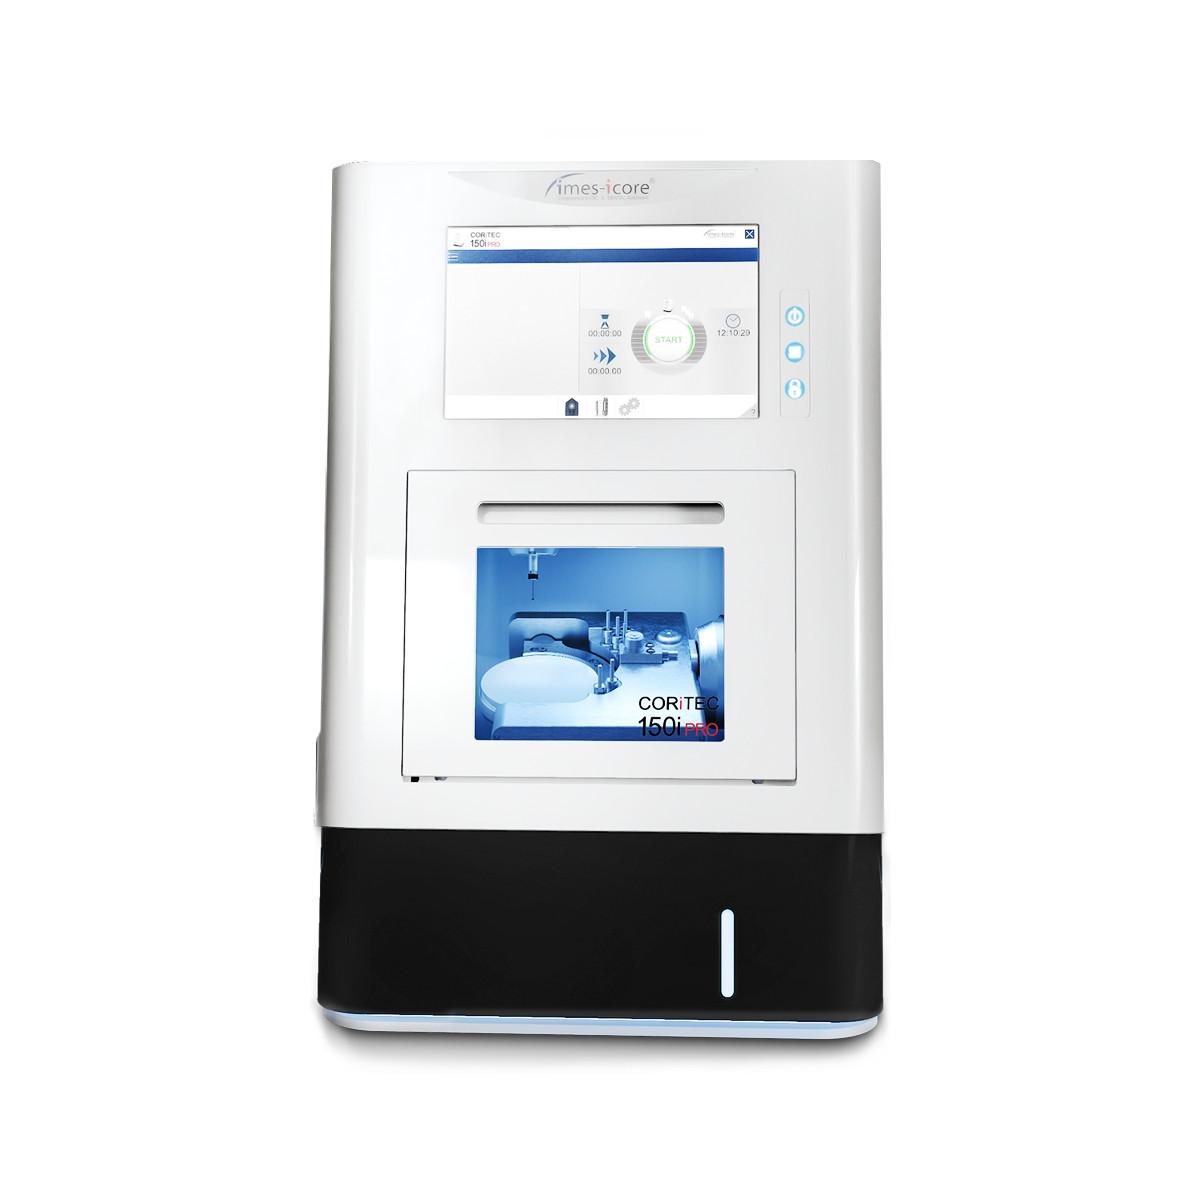 Fresadora CAD CAM / para laboratorio dental / CORiTEC 150i SERIES